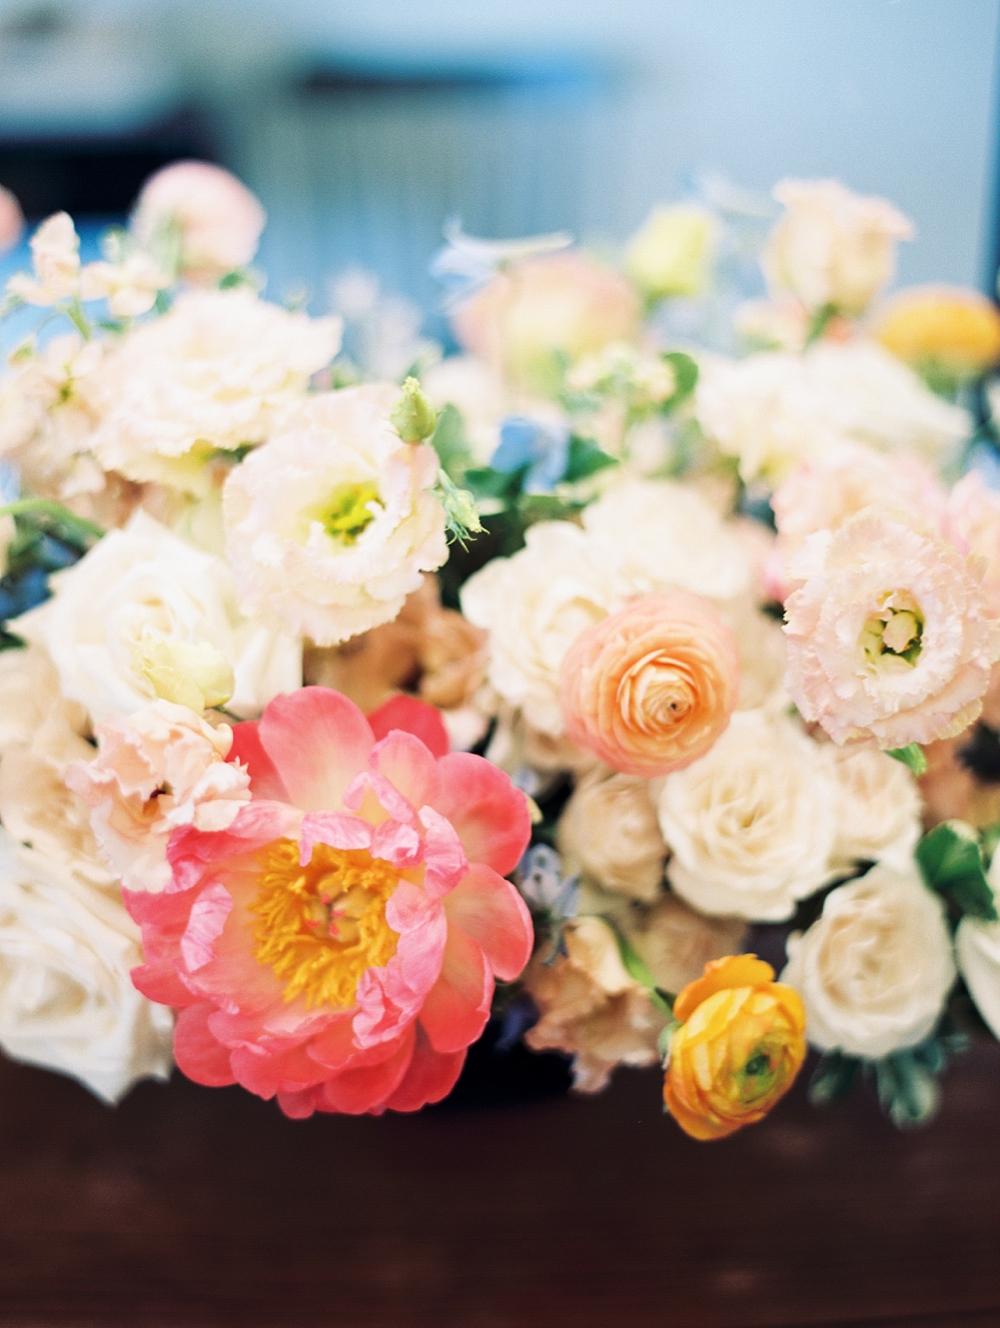 Kristin-La-Voie-Photography-Austin-Wedding-Photographer-the-grand-lady-129